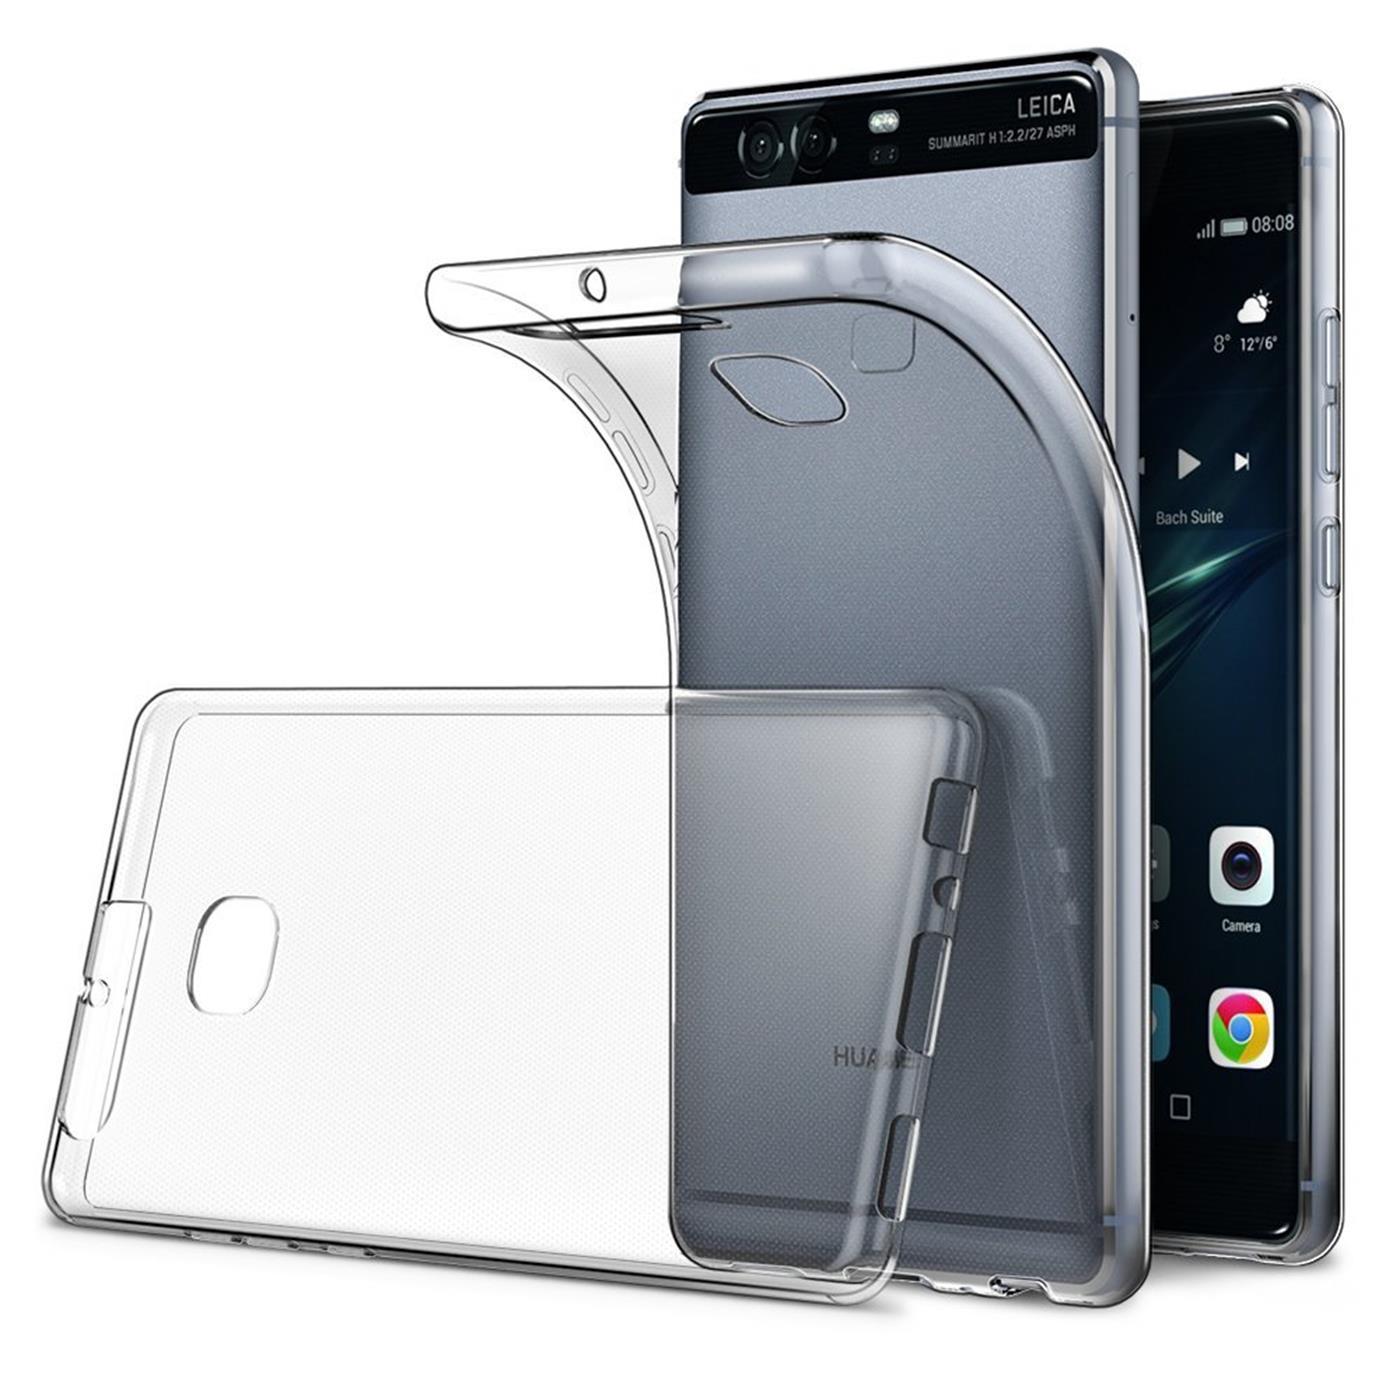 Huawei-p9-Duenn-Silikon-Klar-Case-Cover-Ultra-Slim-Stossfeste-Gel-Rueckseite Indexbild 2